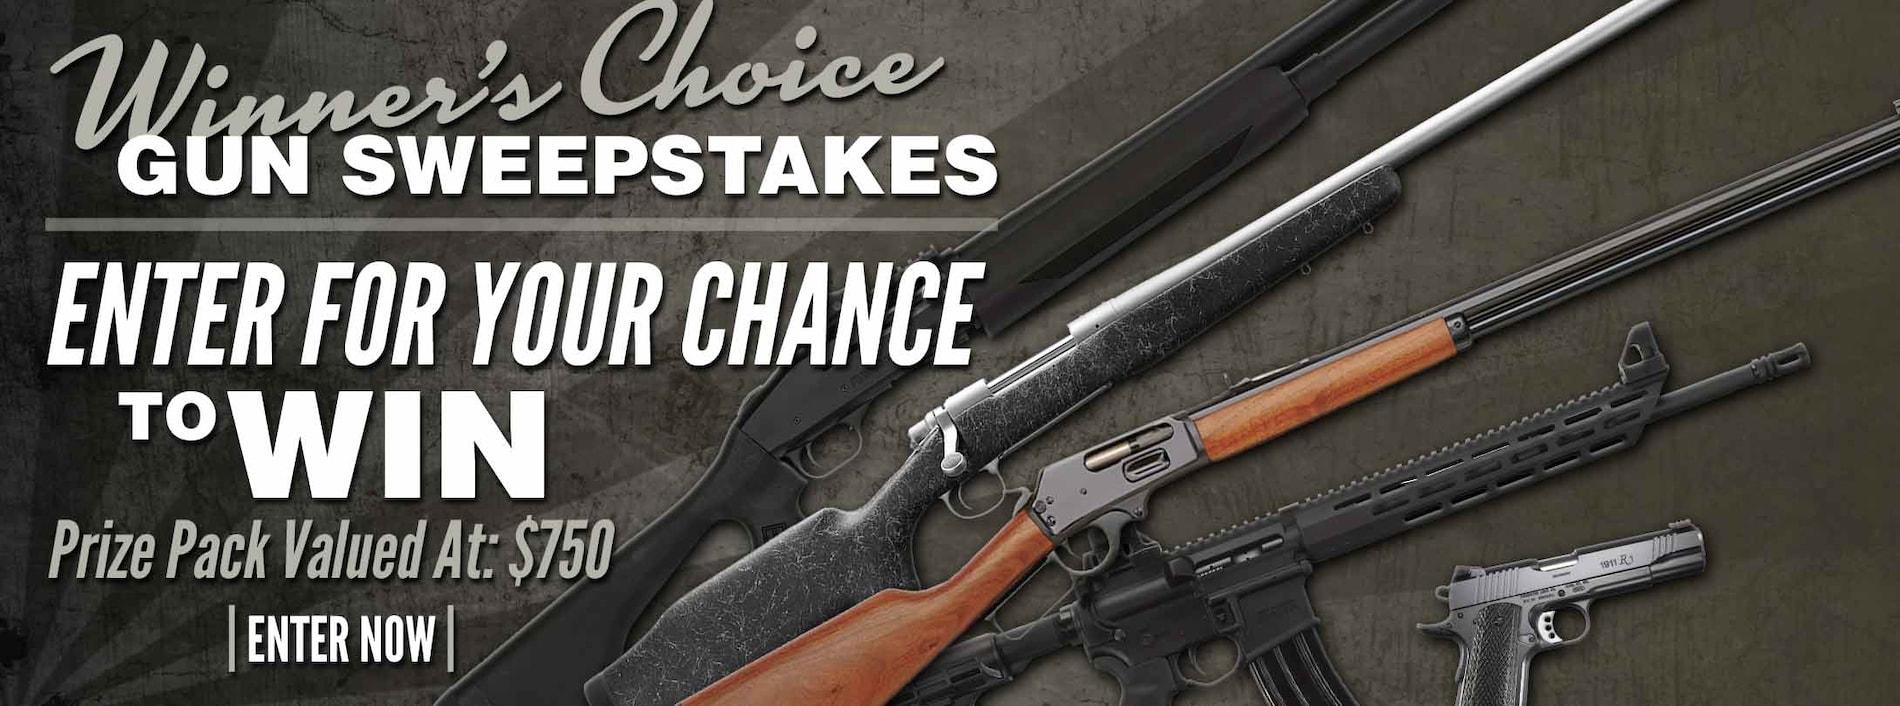 Chance to Win A Gun!